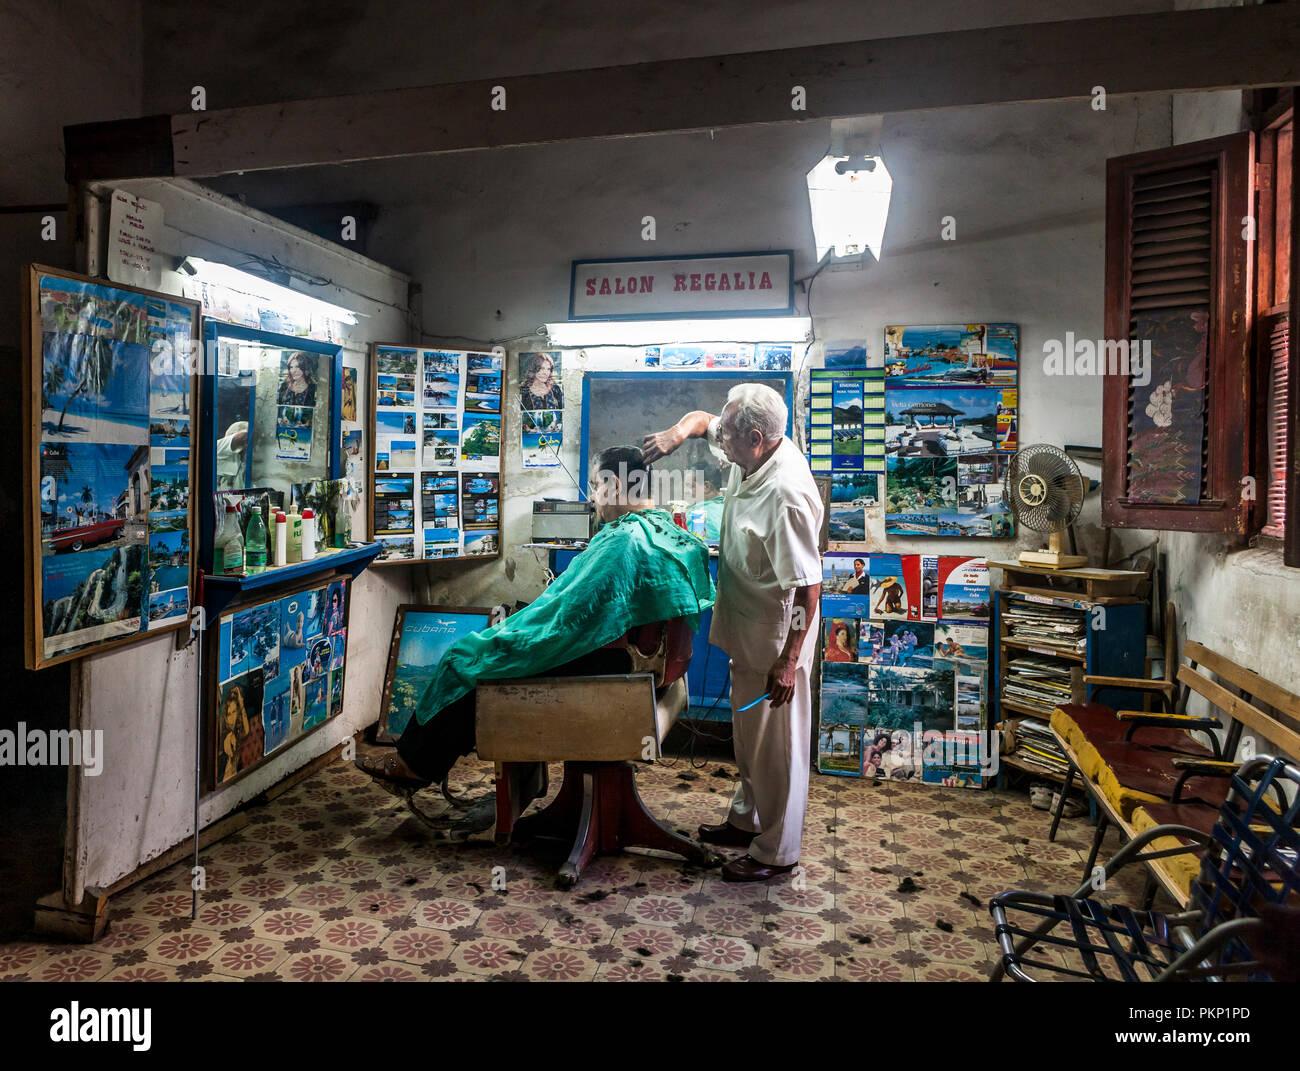 Regalia, Havana, Cuba. 22nd January 2013. A barber cuts his clients hair in his shop in Regalia, Cuba. - Stock Image